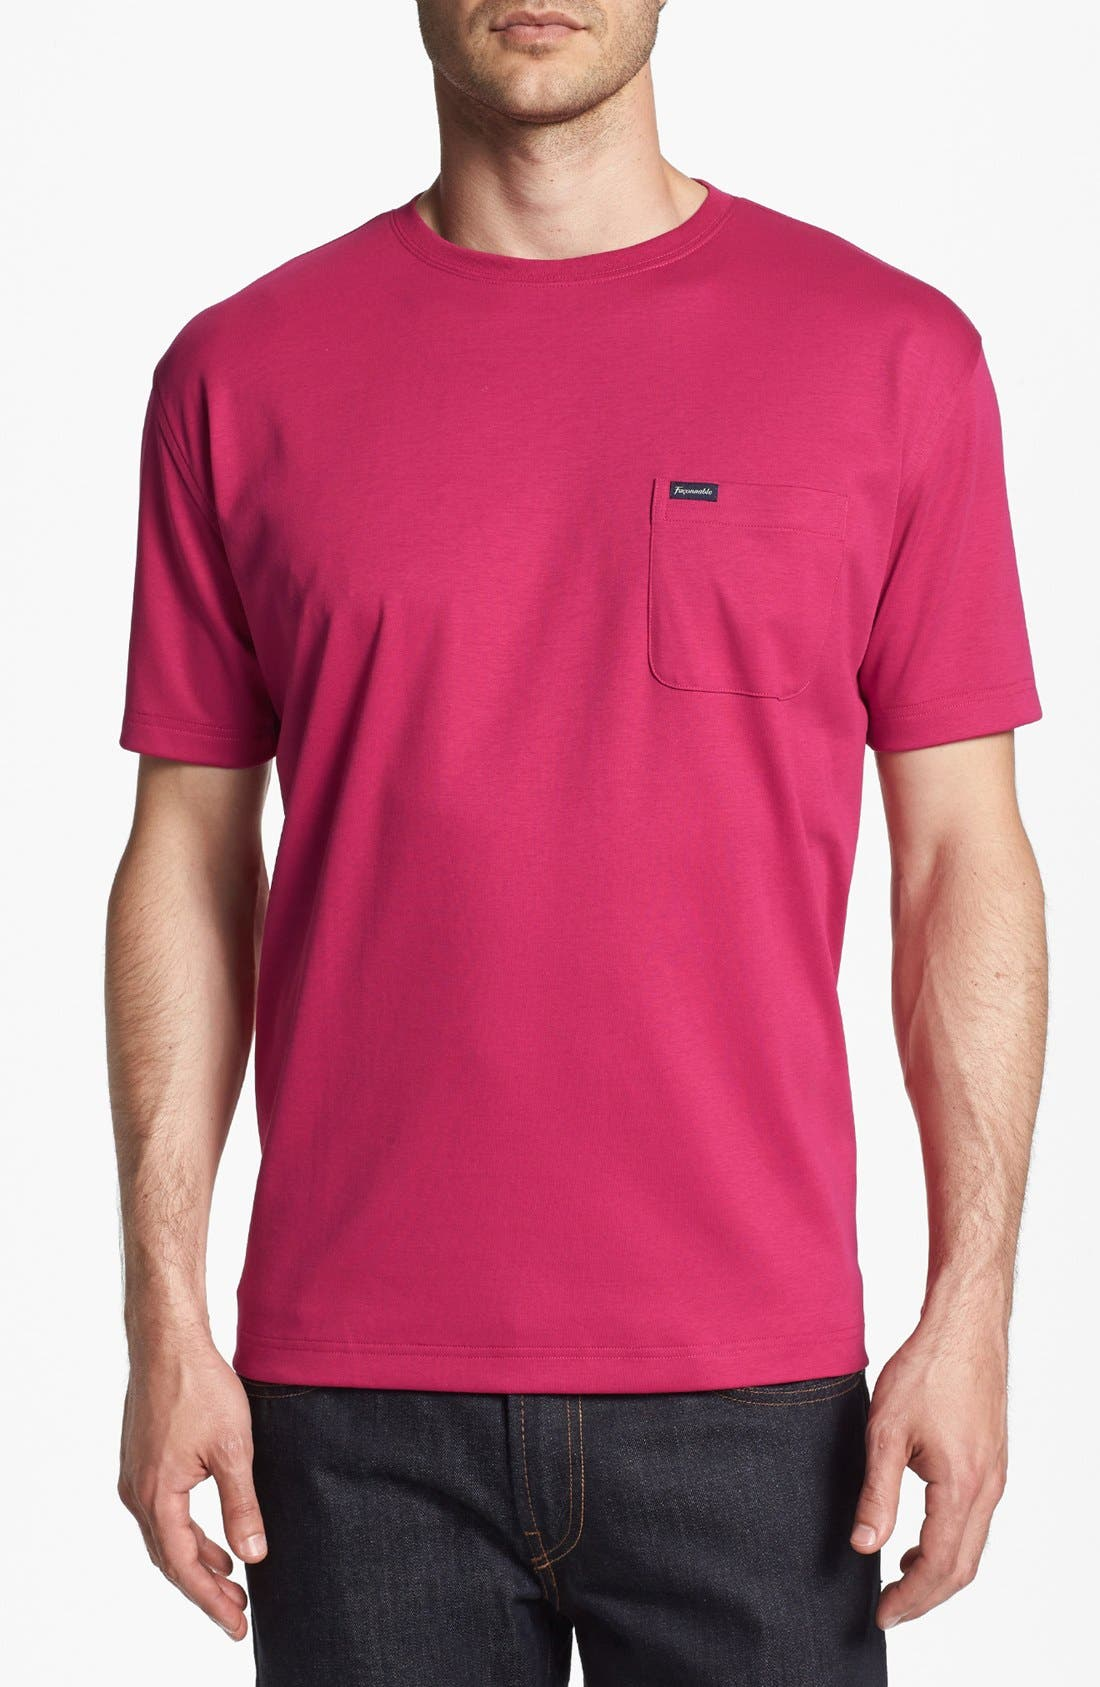 Main Image - Façonnable Crewneck T-Shirt